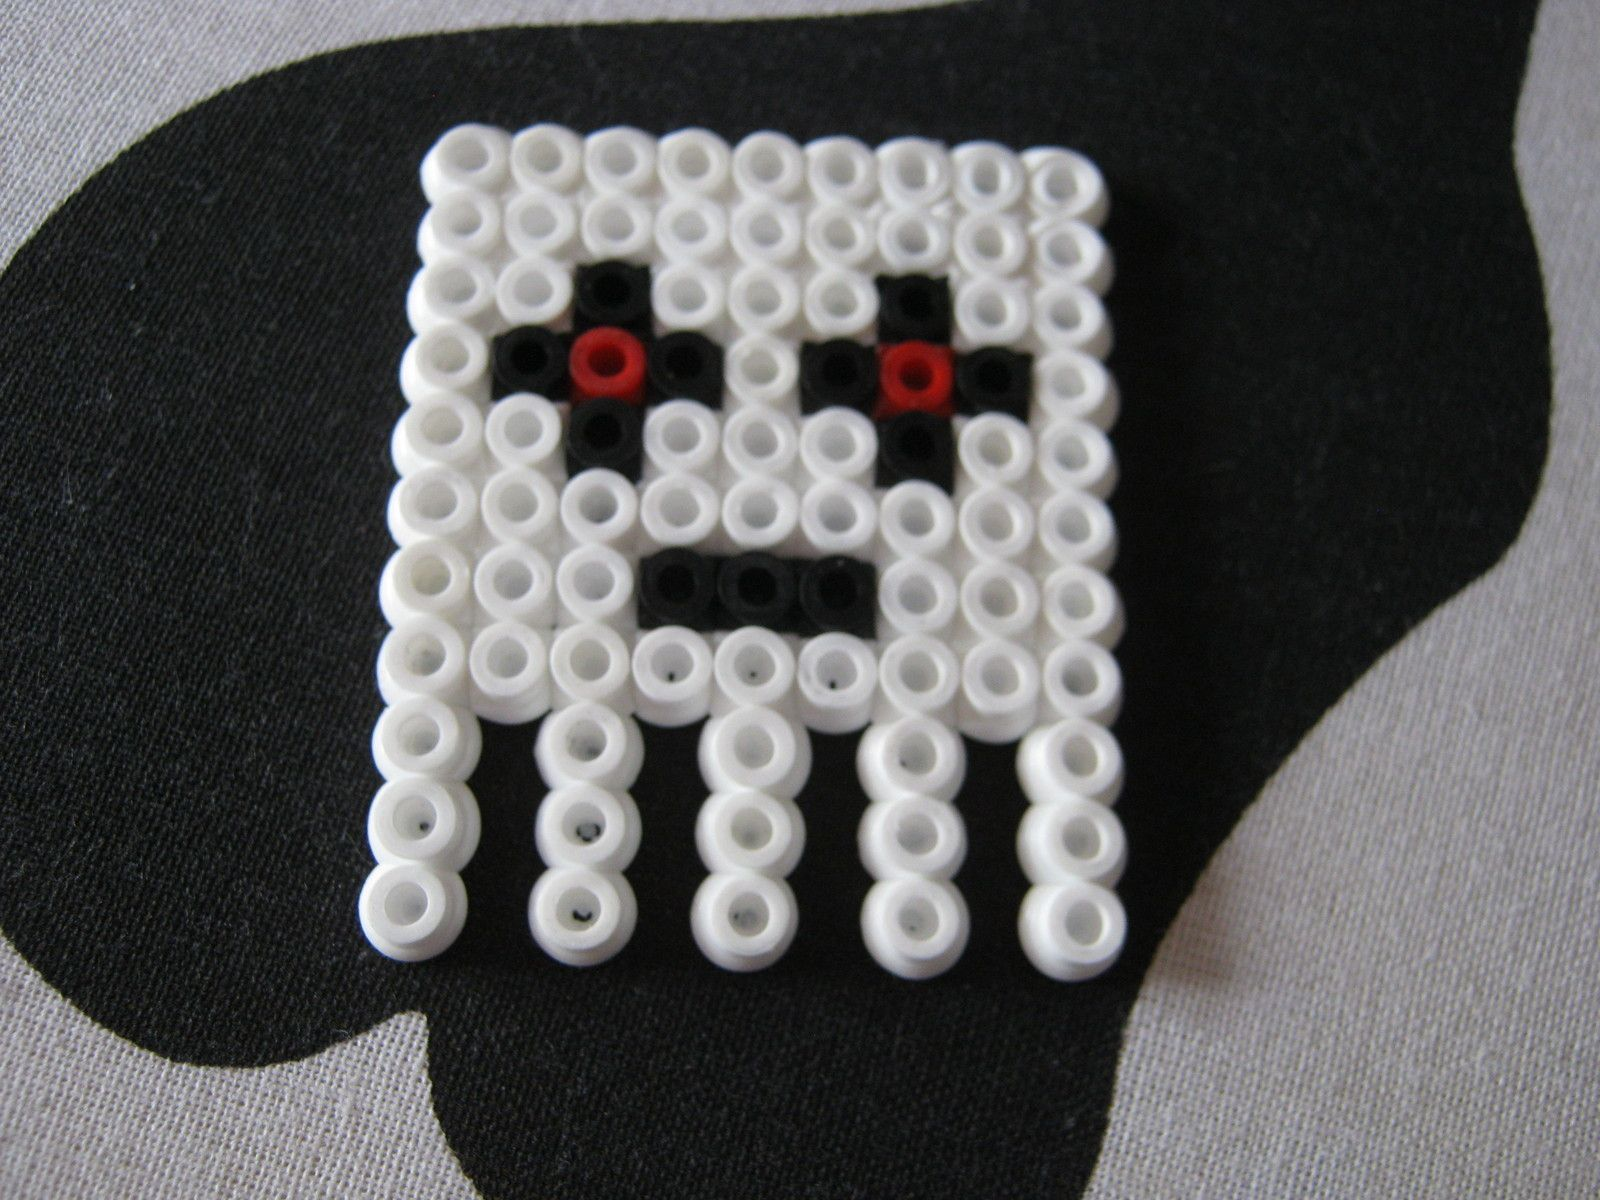 http://s3.amazonaws.com/images.coplusk.net/project_images/153064/image/Minecraft_Ghast__Hama__5.jpg